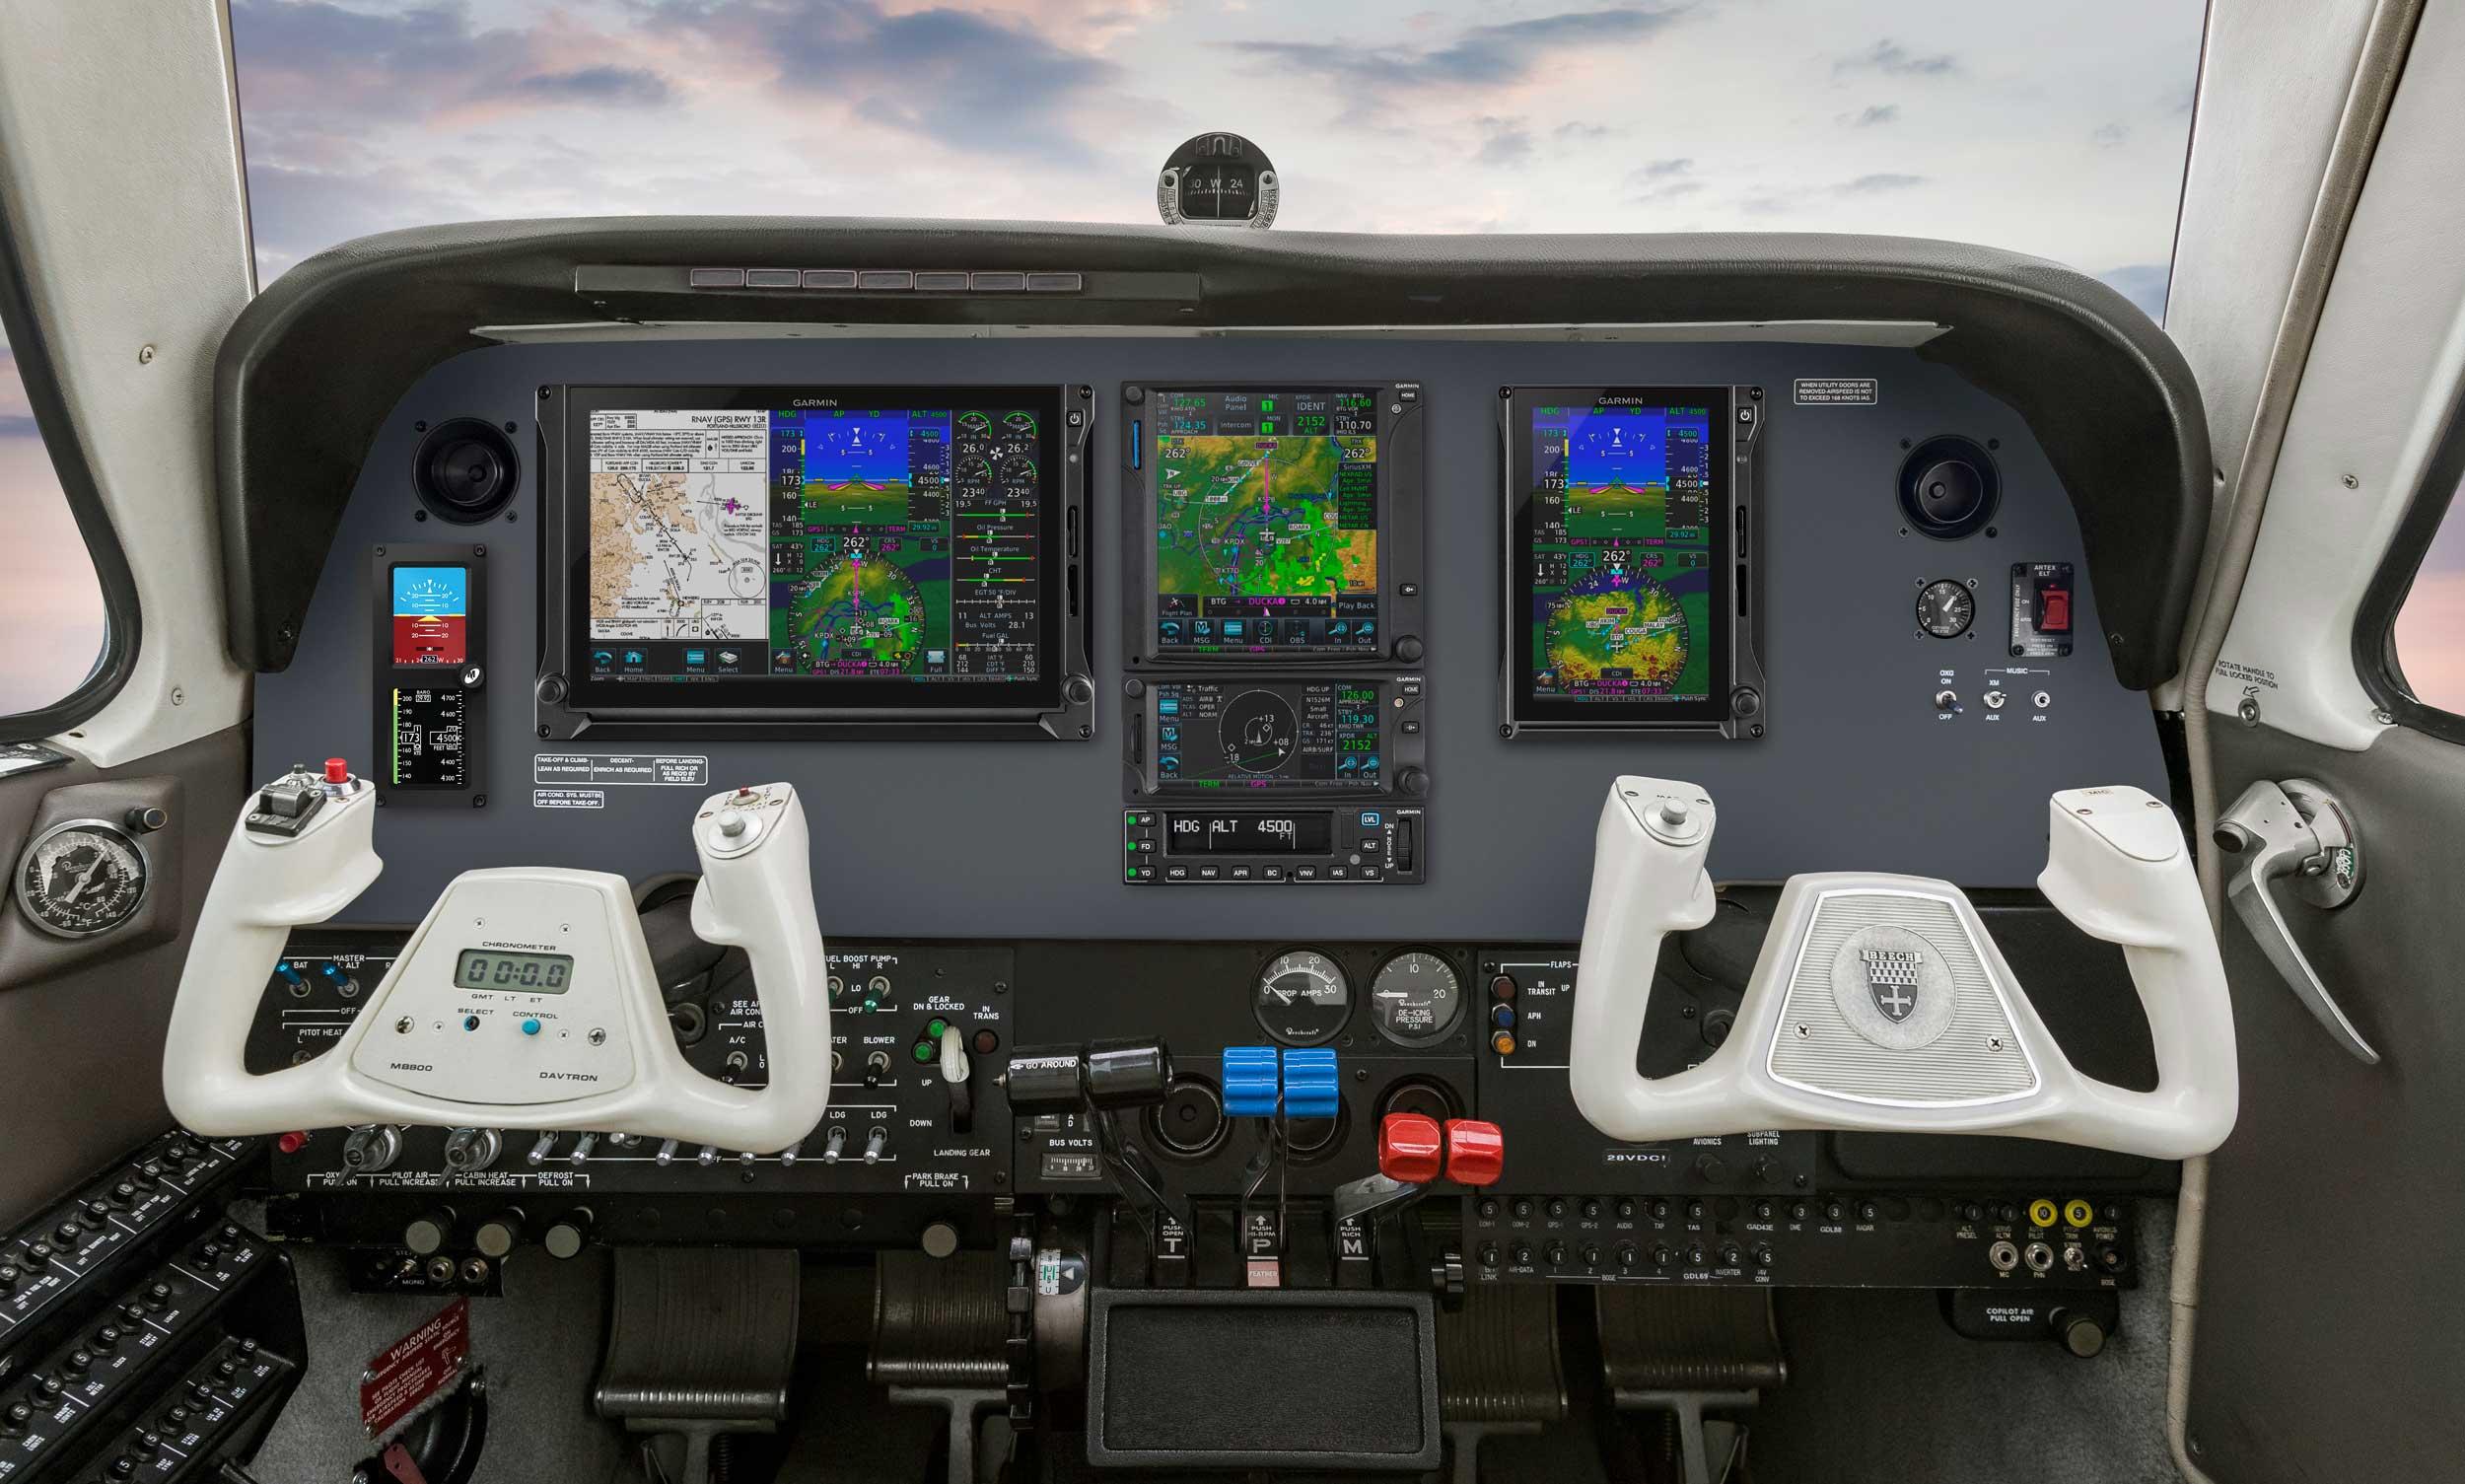 Garmin receives autopilot STC for Beech and Cessna twins